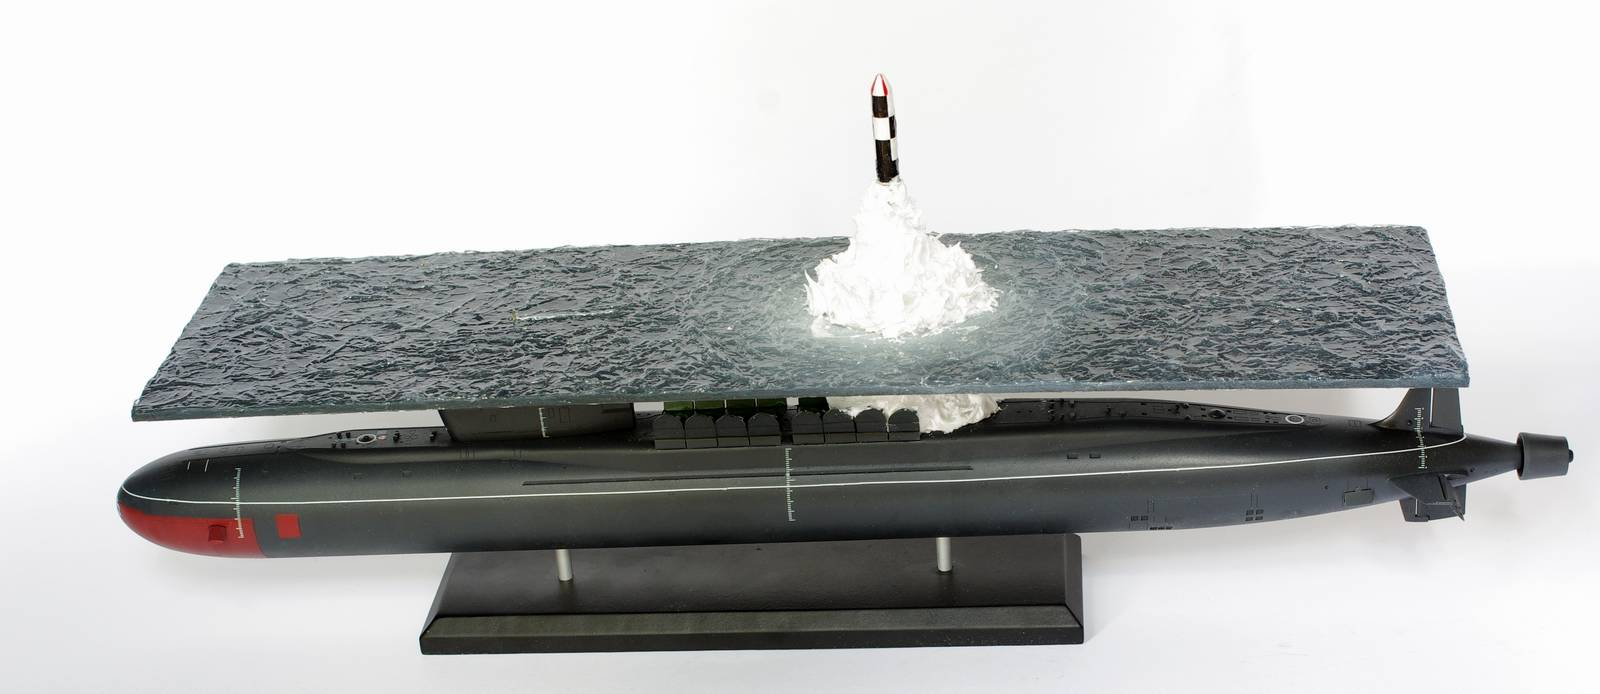 Great scale model of Russian submarine Yury Dolgorukiy (K-535) - 15